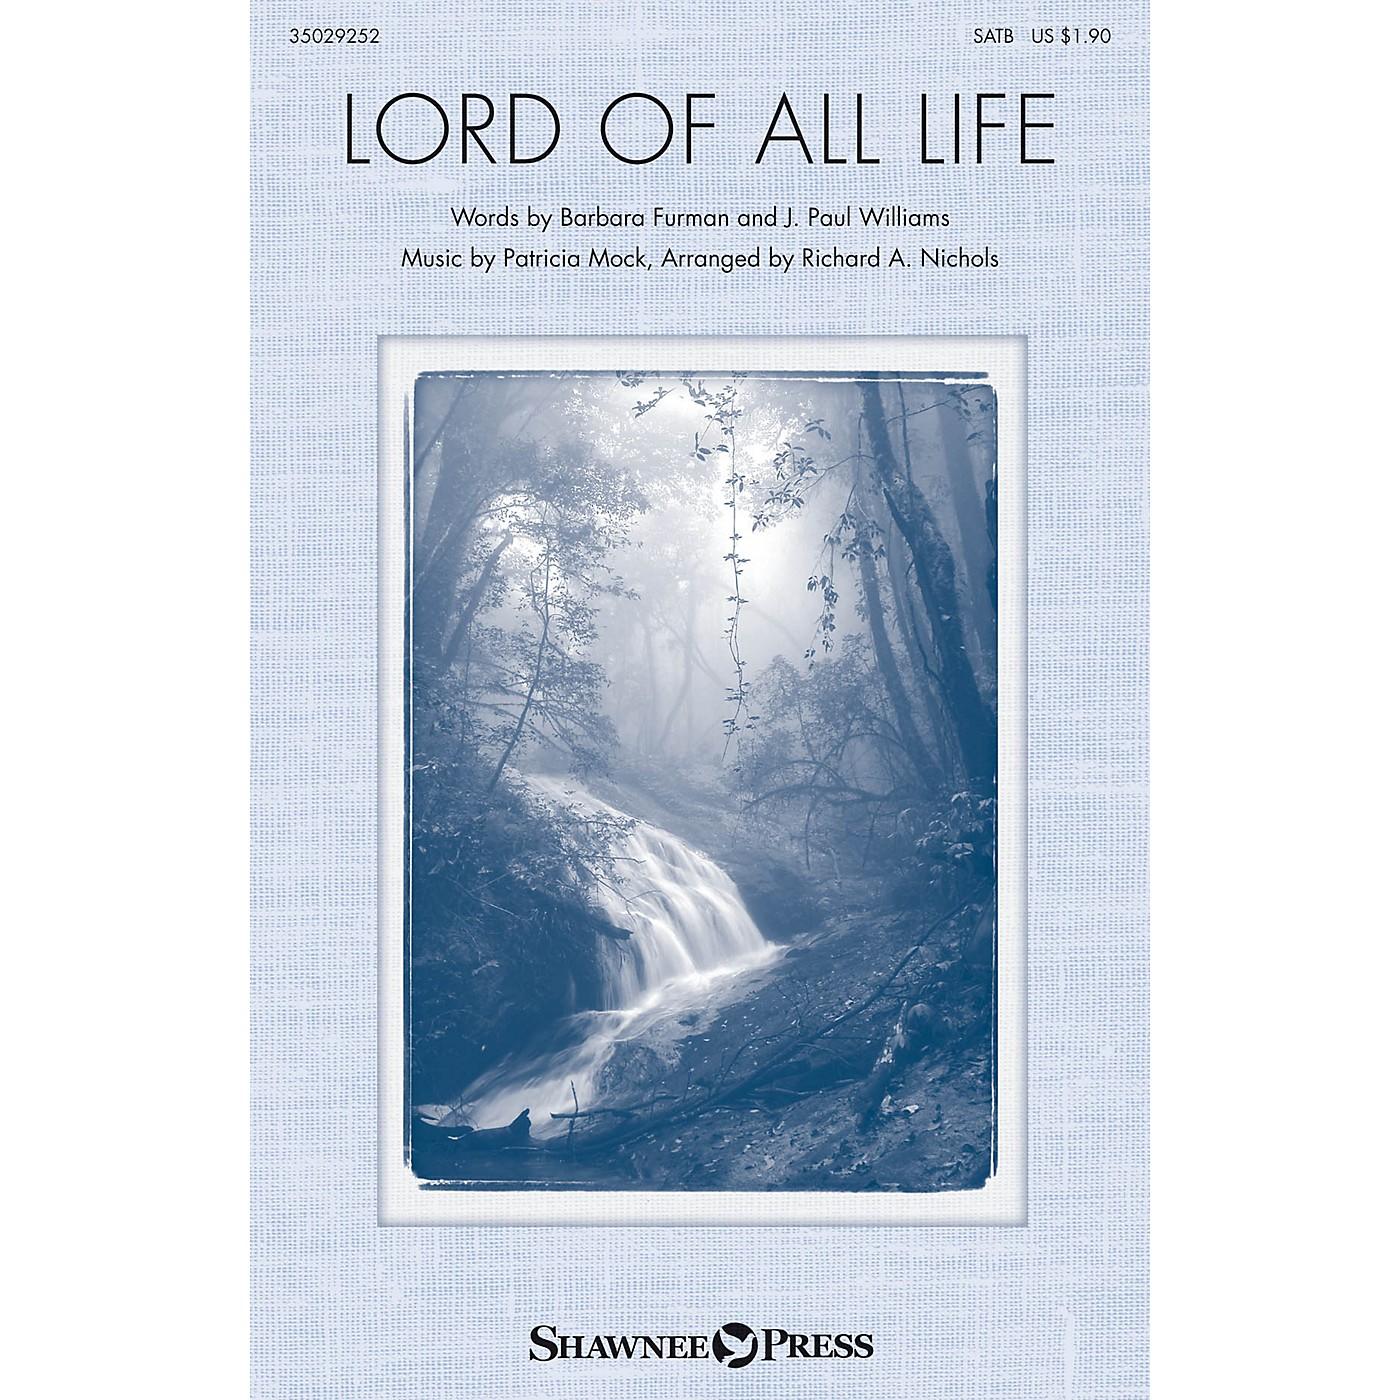 Shawnee Press Lord of All Life SATB arranged by Richard A. Nichols thumbnail